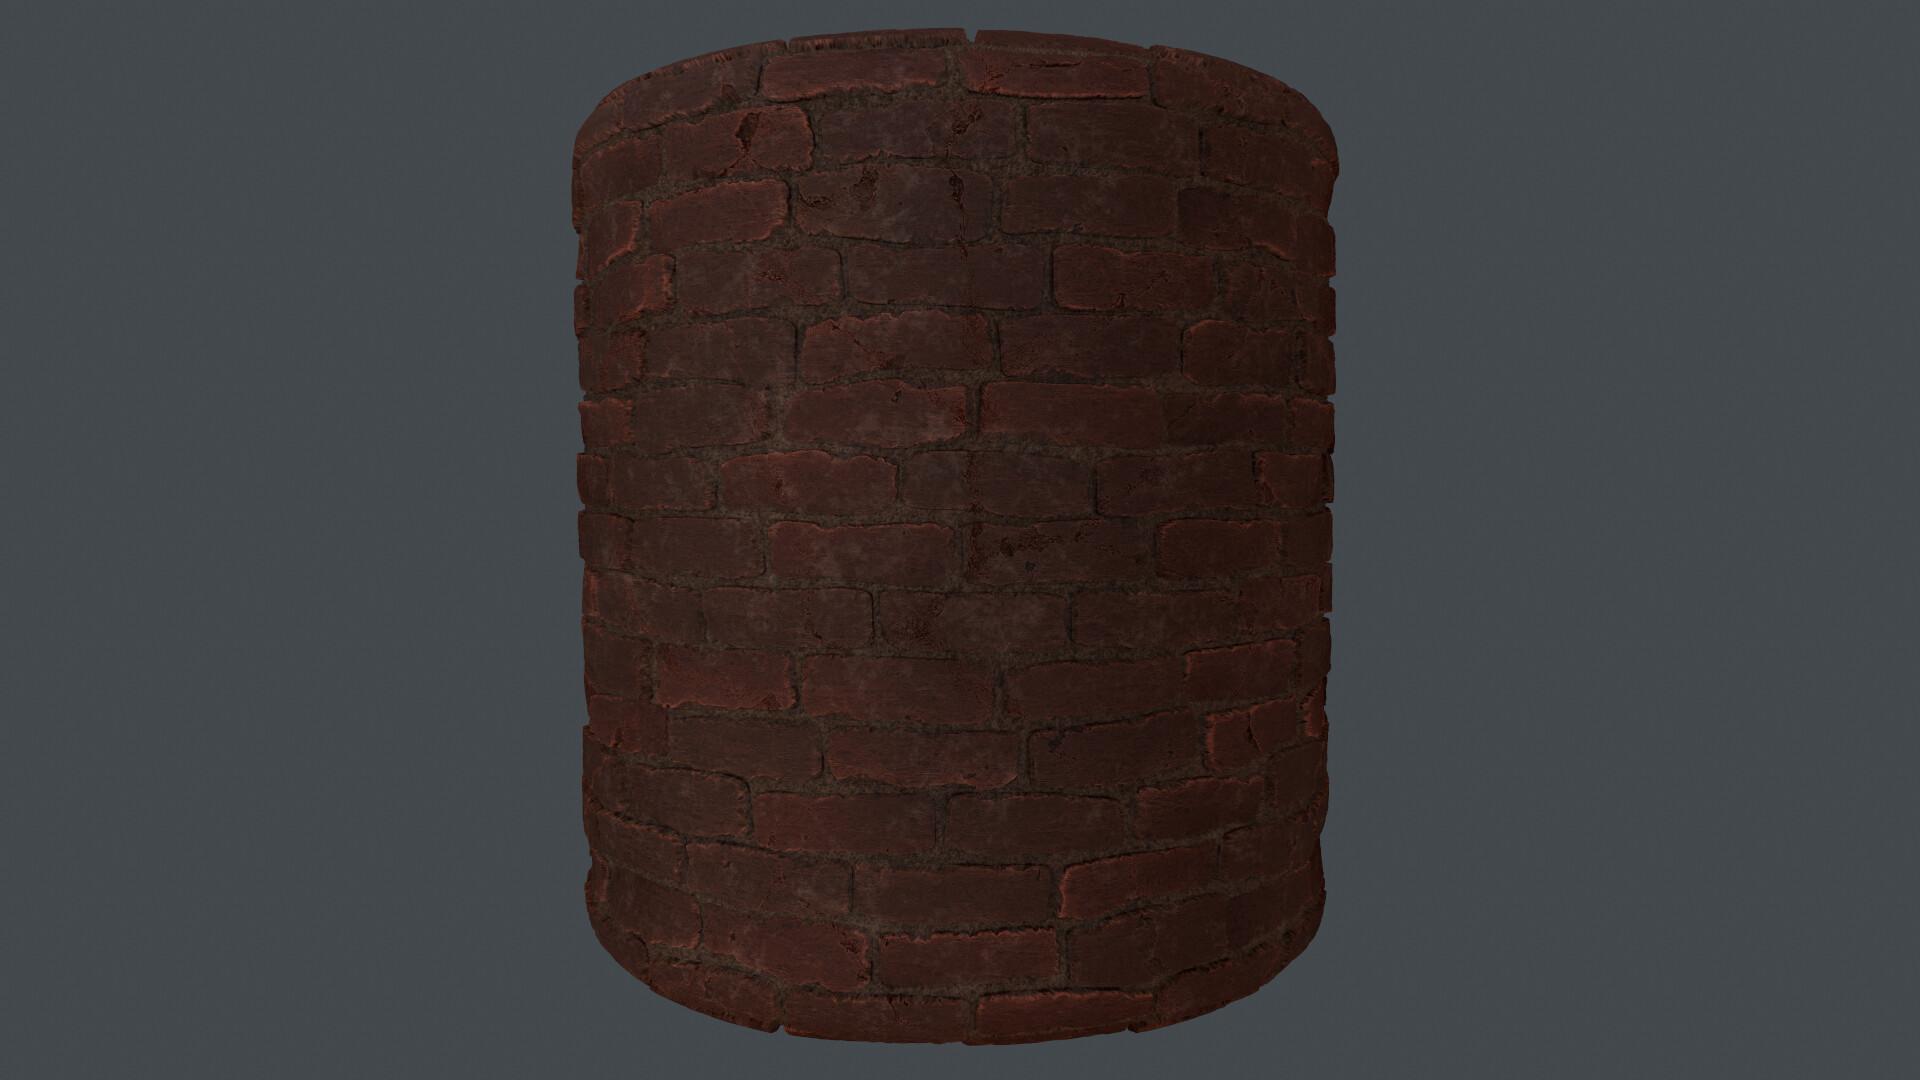 brick material made in substance designer